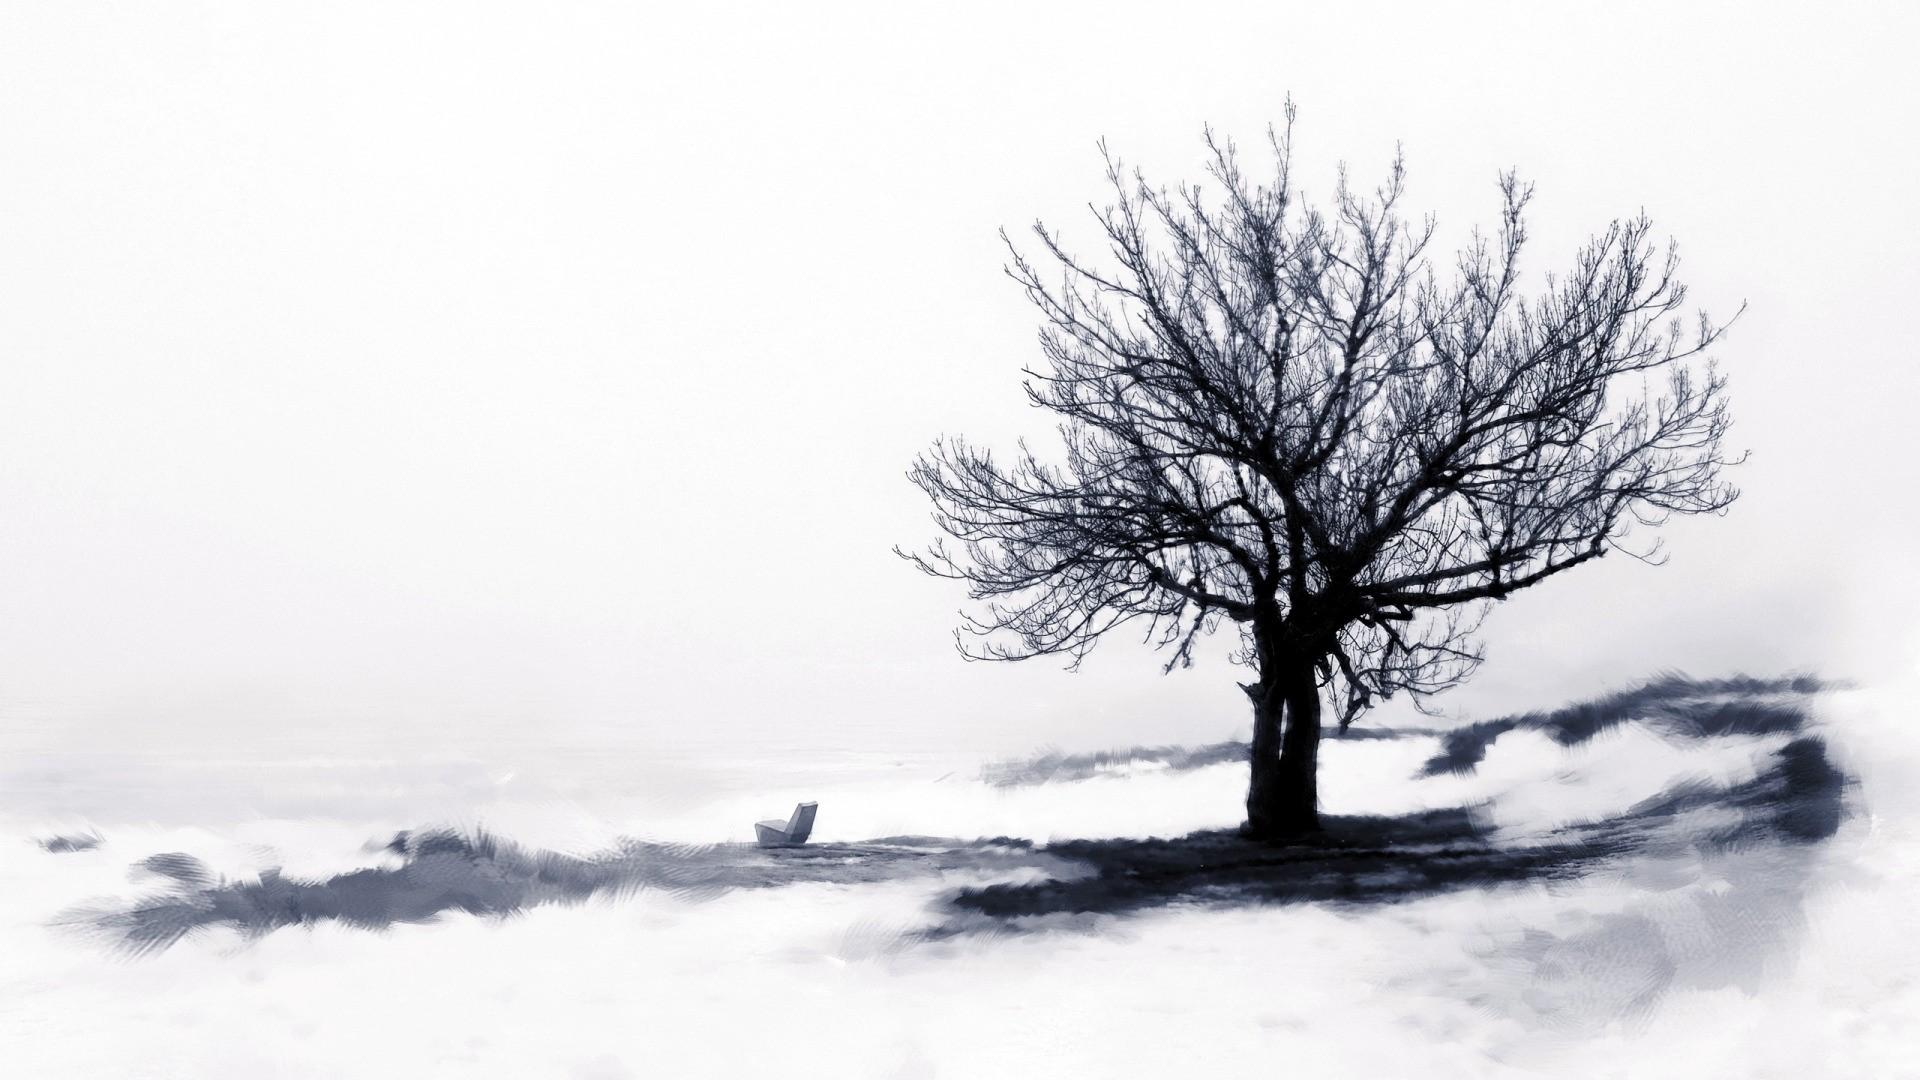 Lonely Trees Minimalist Background